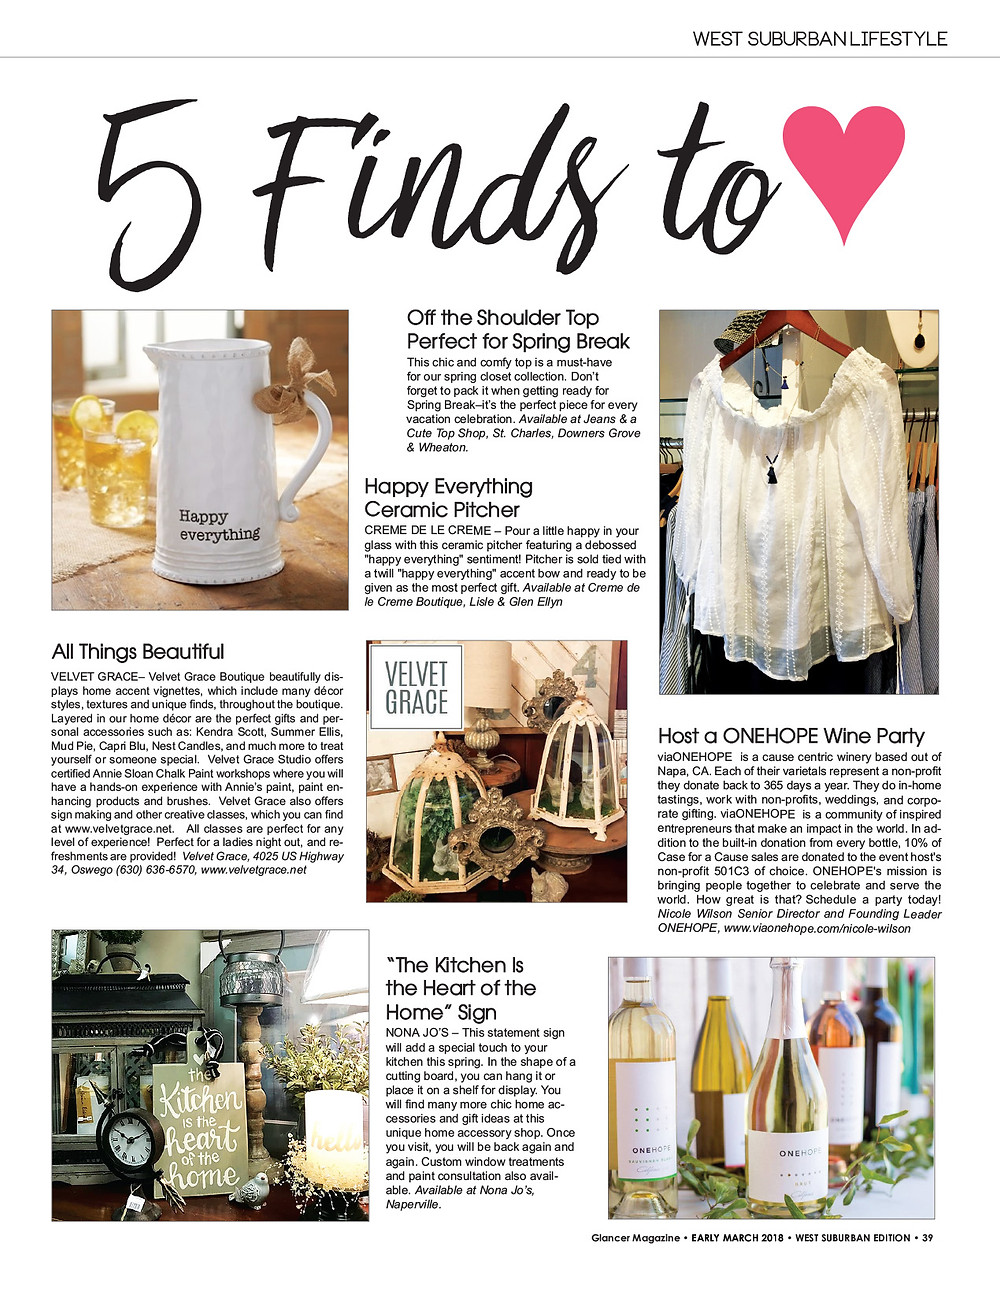 5 Finds to Love, Glancer Magazine, March 2018